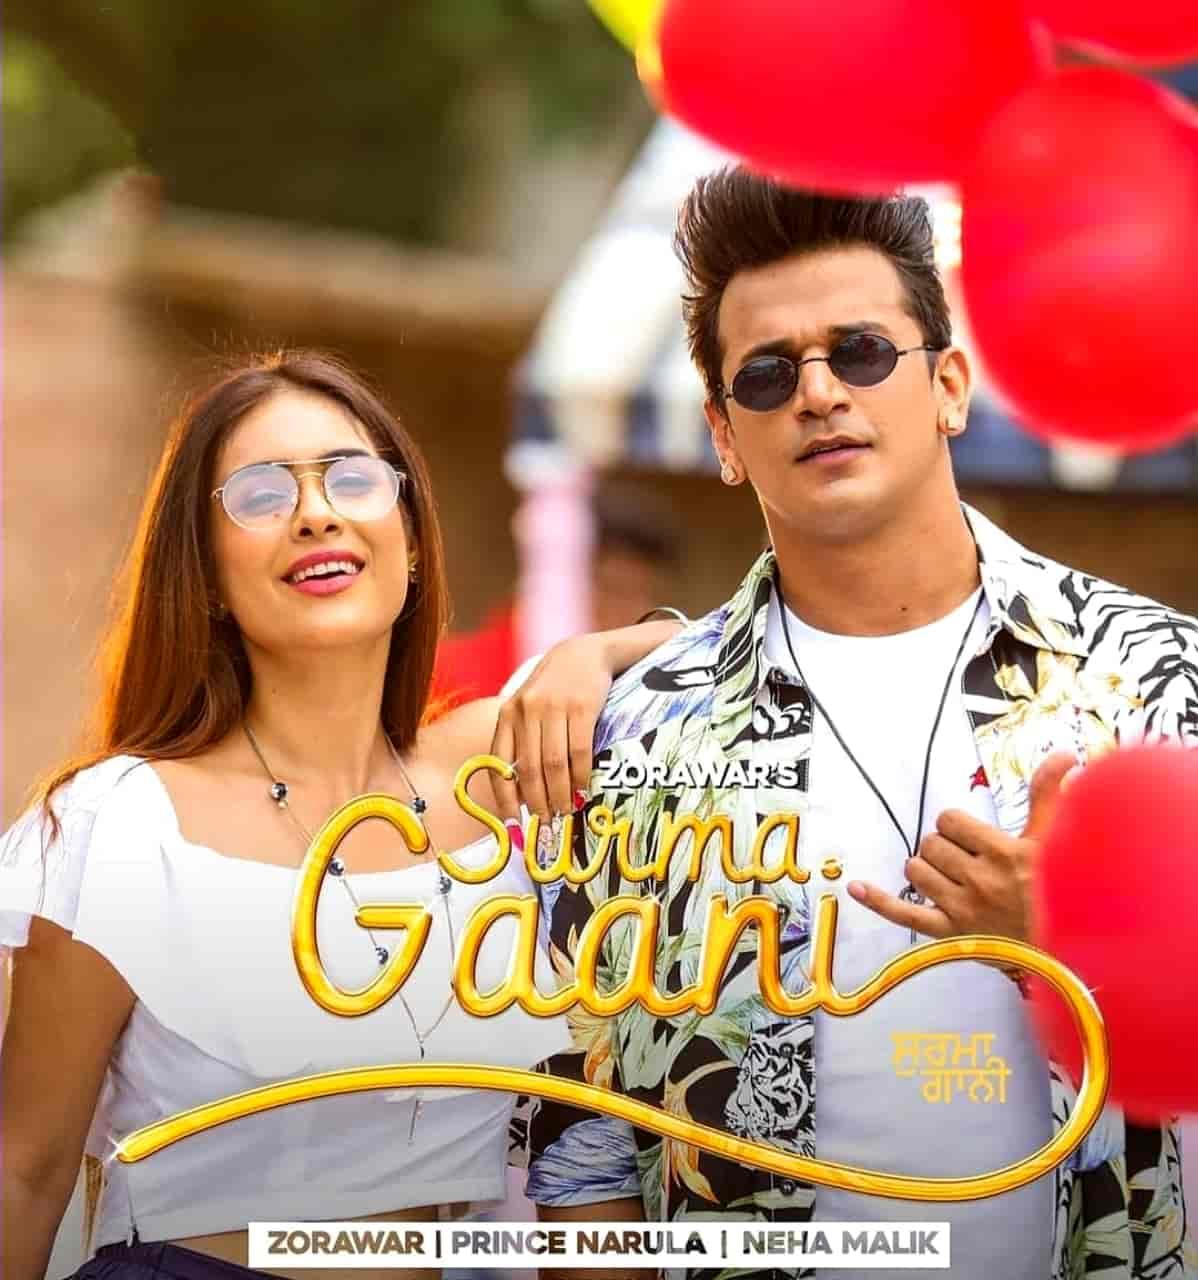 Surma Gaani Punjabi Song Image Features Prince Narula and Neha Malik sung by Zorawar